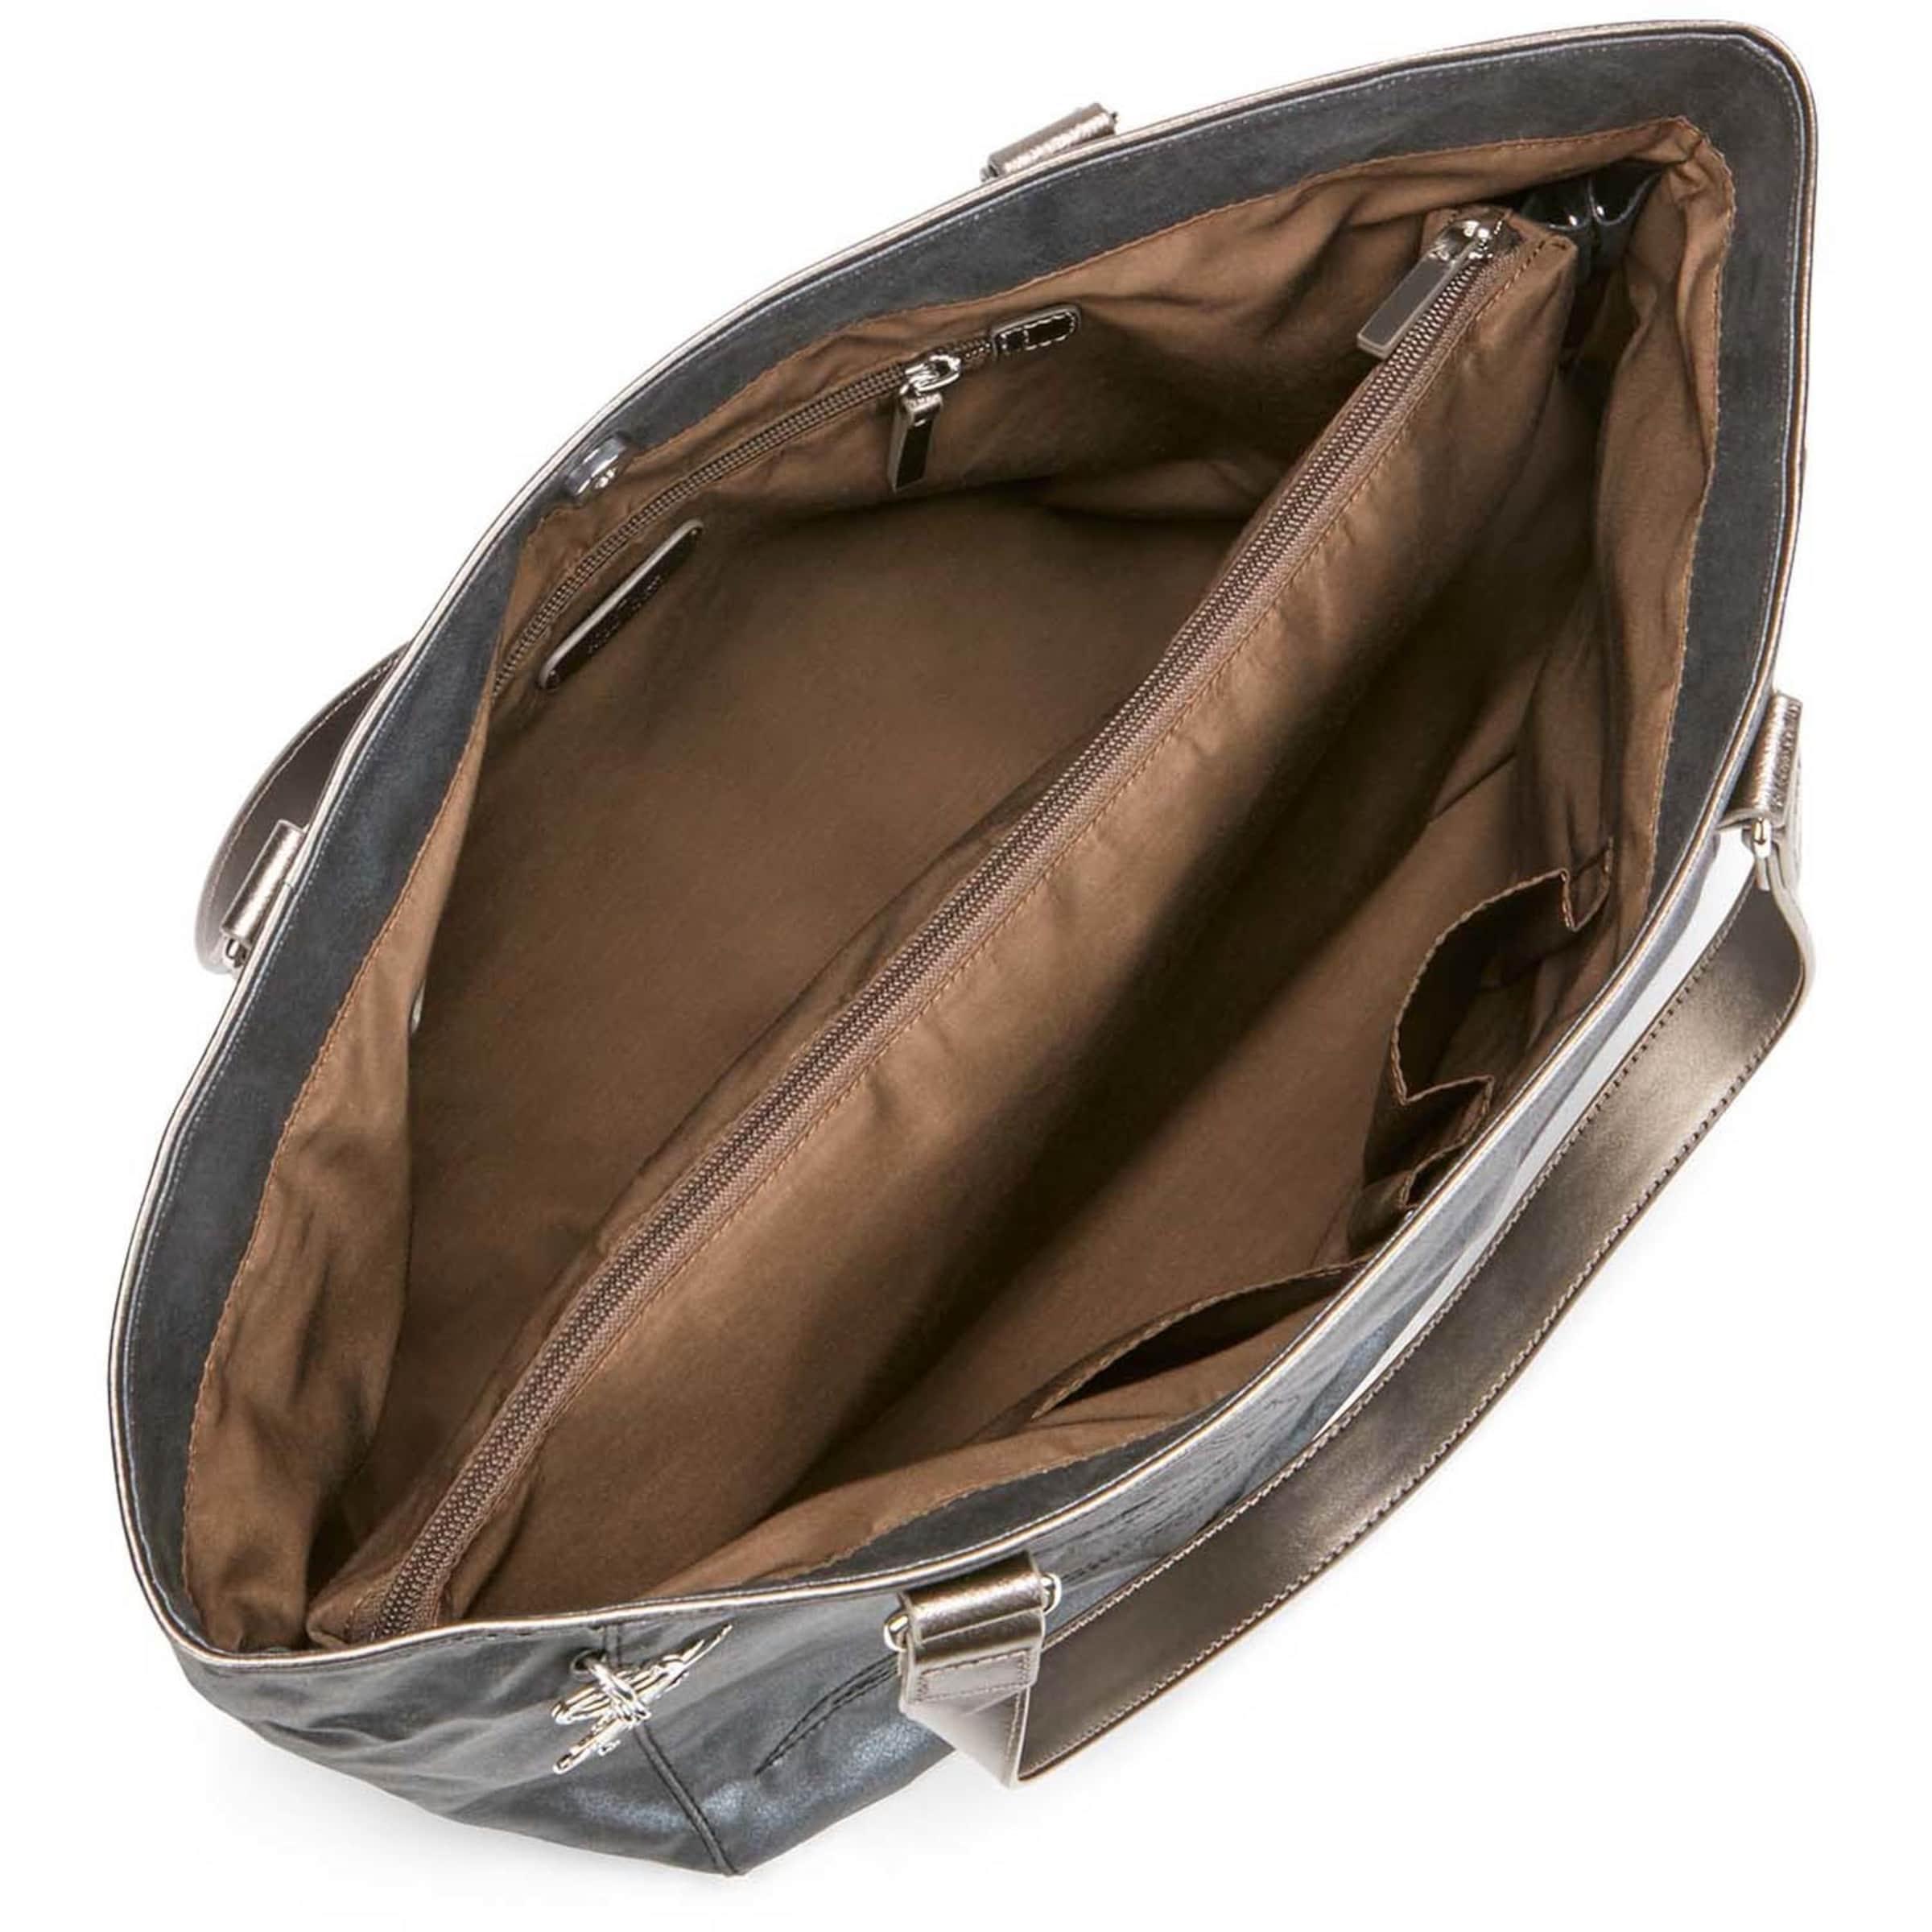 KIPLING City Shopper Tasche 52 cm Kaufen Billig Kaufen 7Nyqx